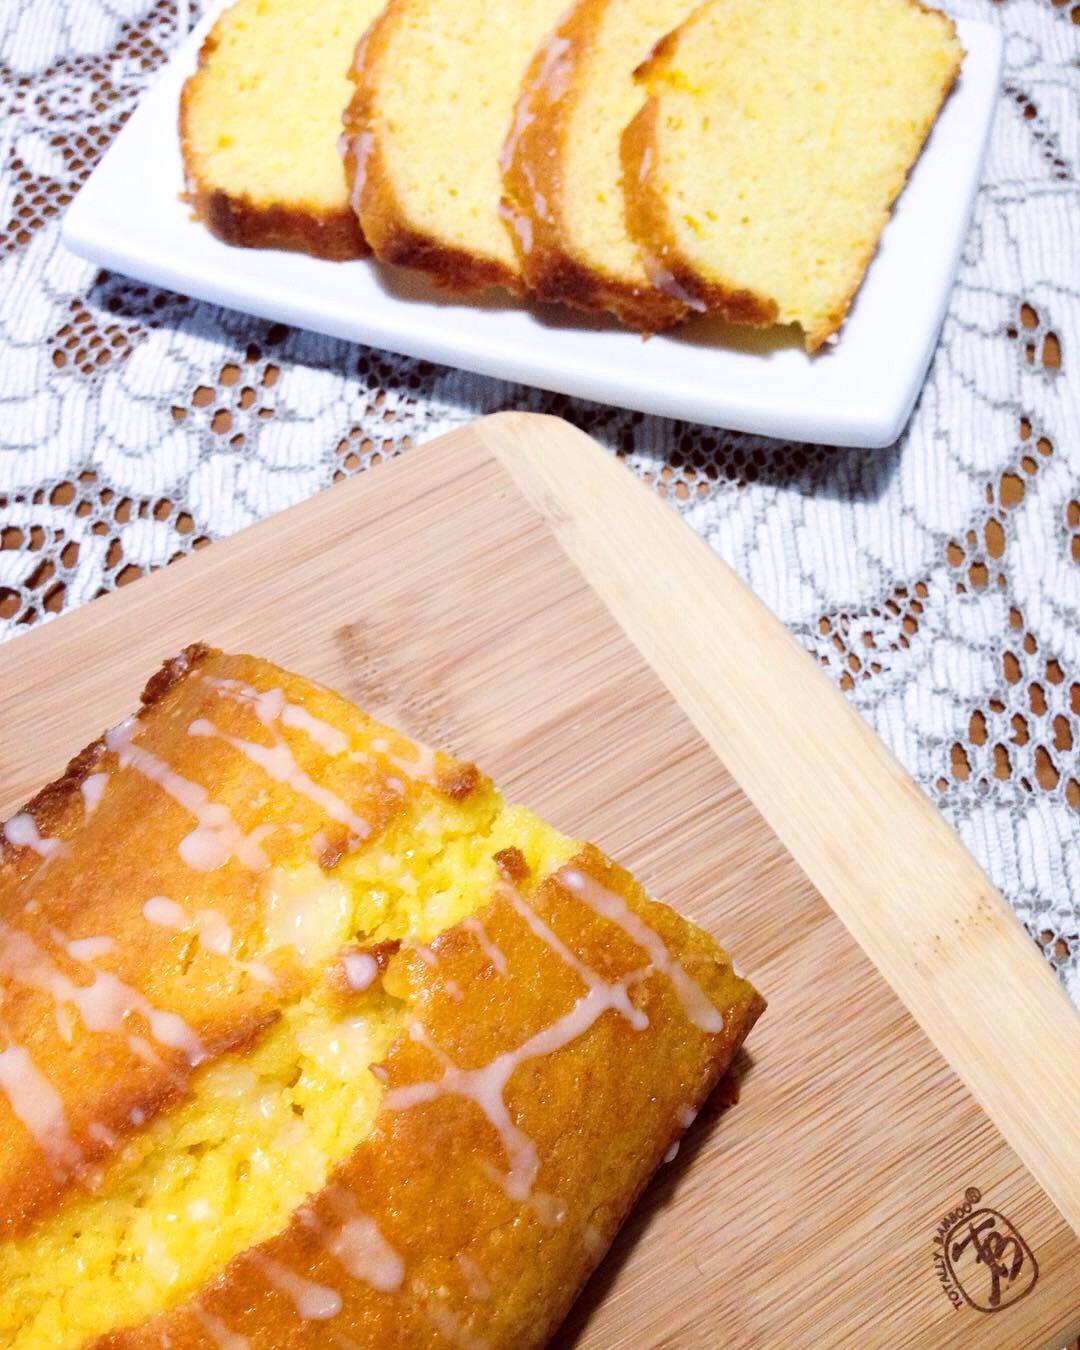 Bay Leaf Pound Cake